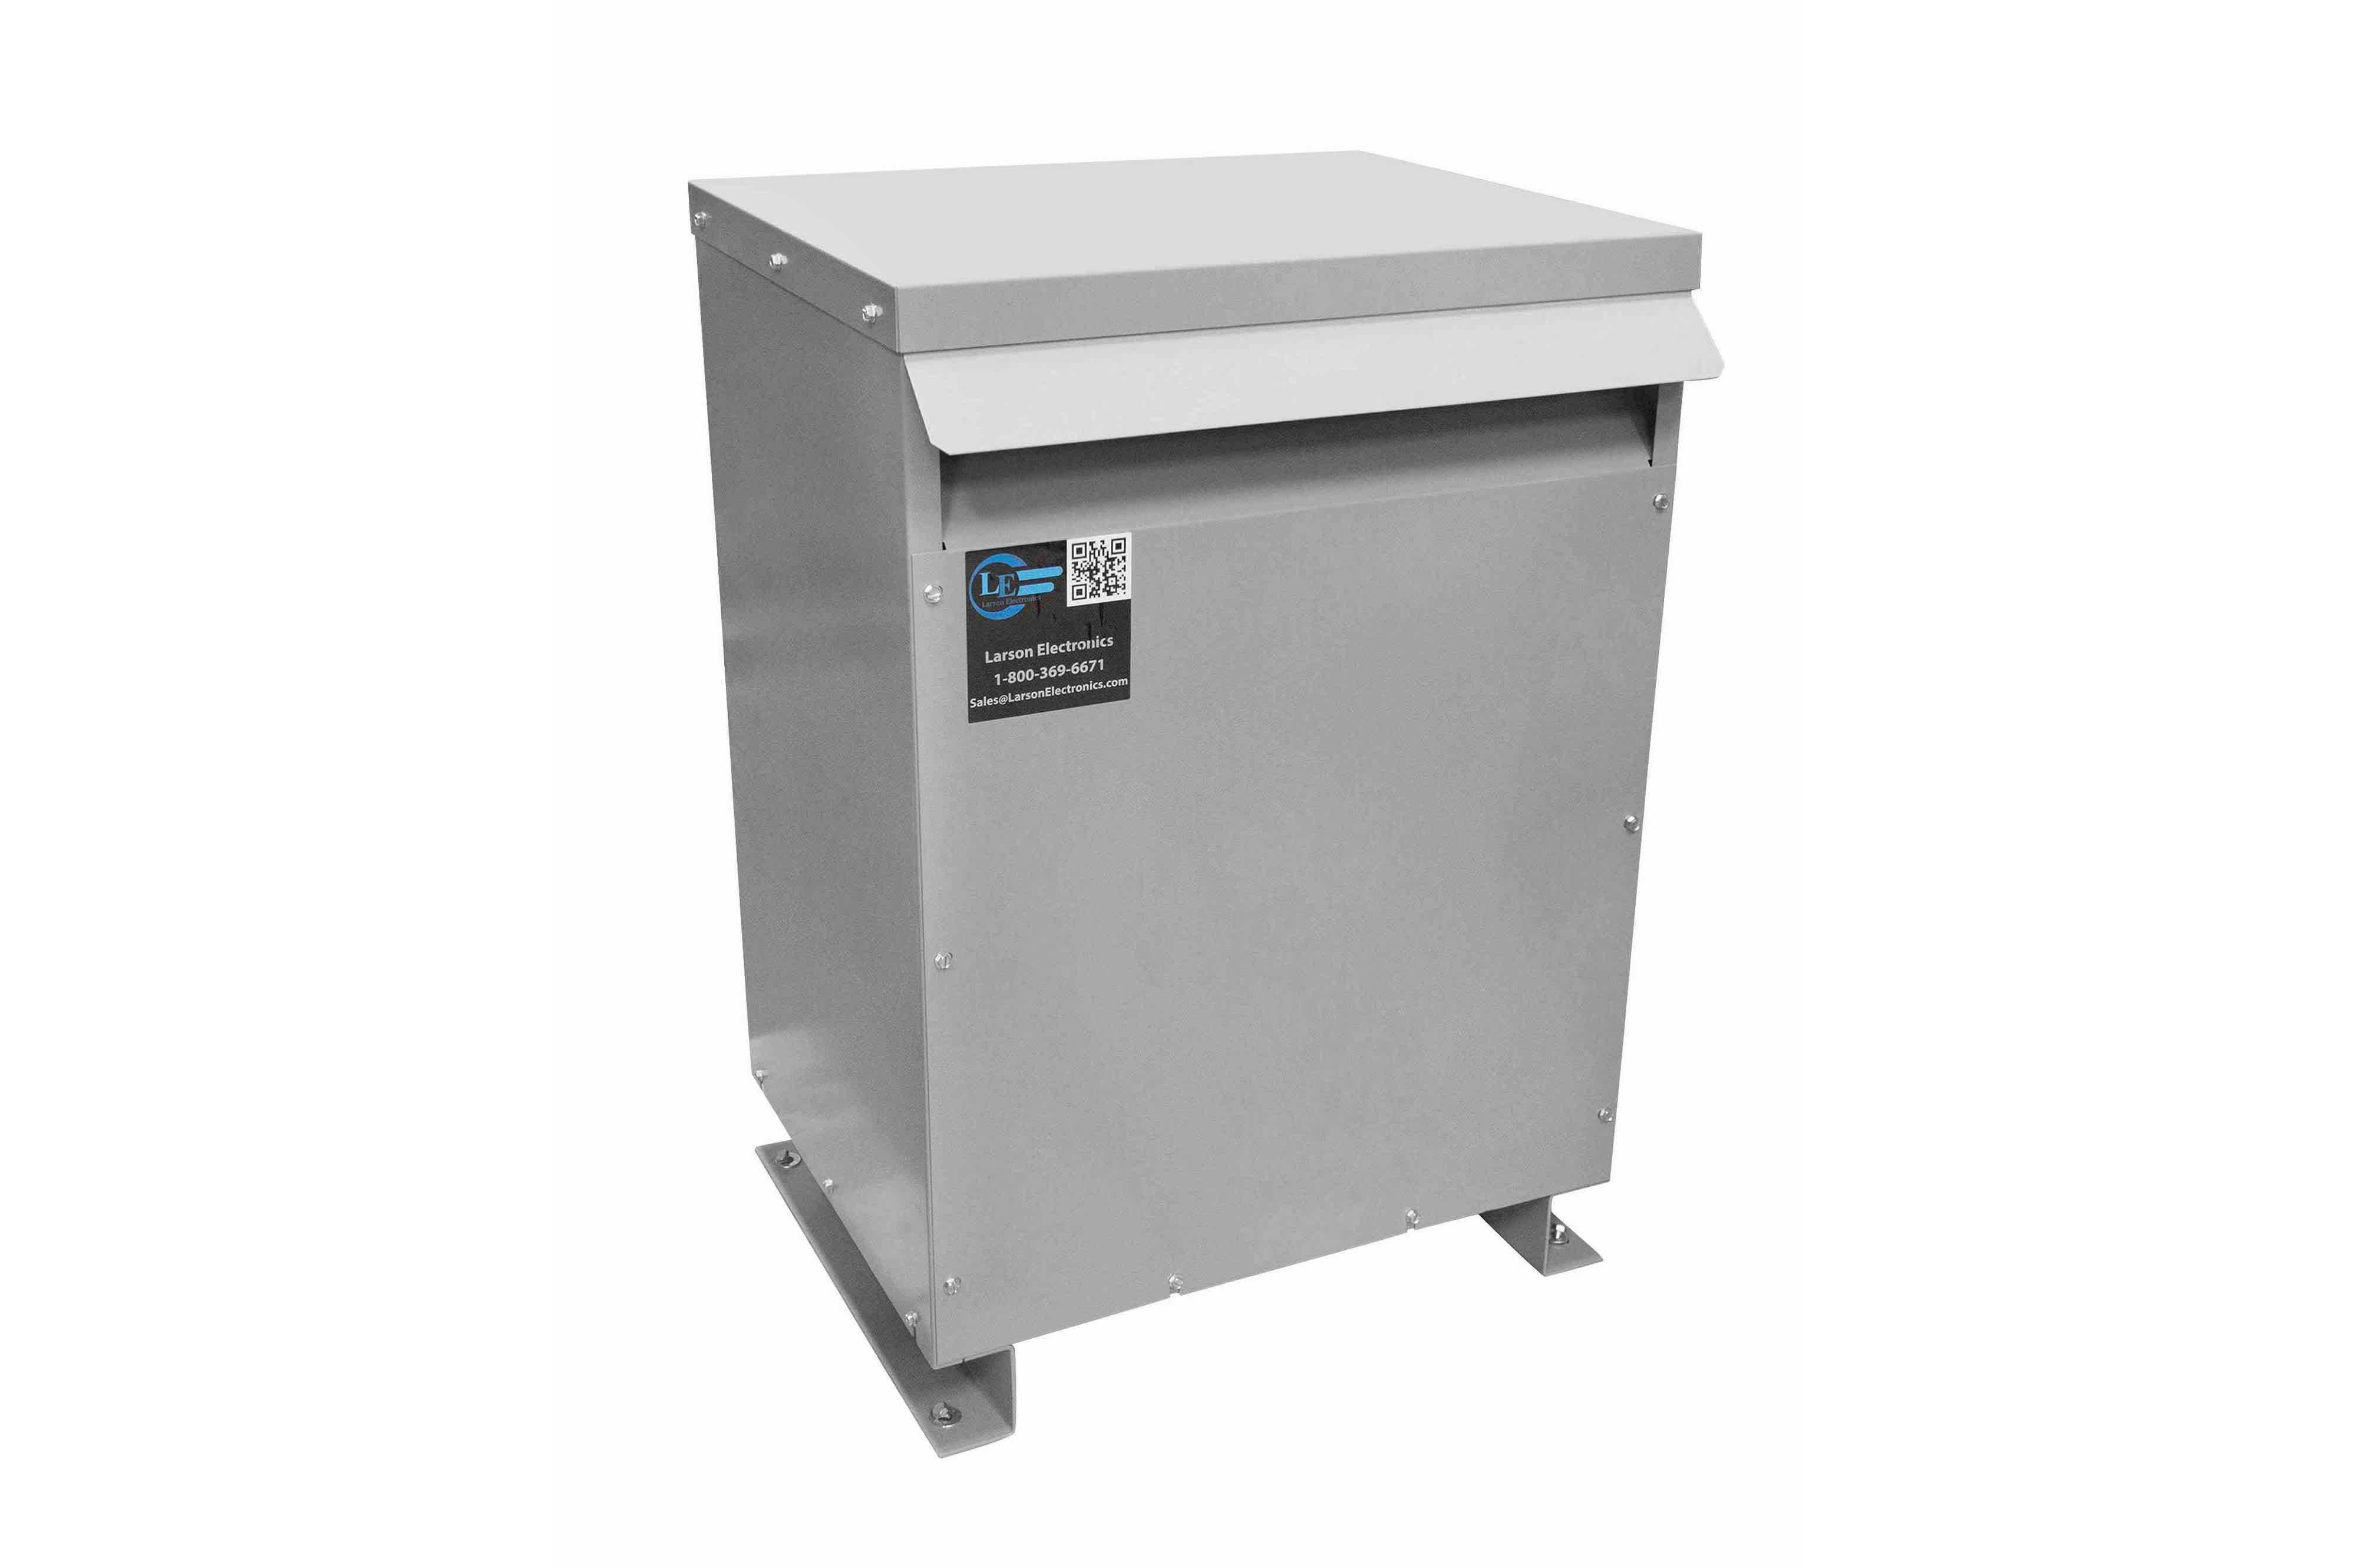 112.5 kVA 3PH Isolation Transformer, 220V Wye Primary, 208V Delta Secondary, N3R, Ventilated, 60 Hz